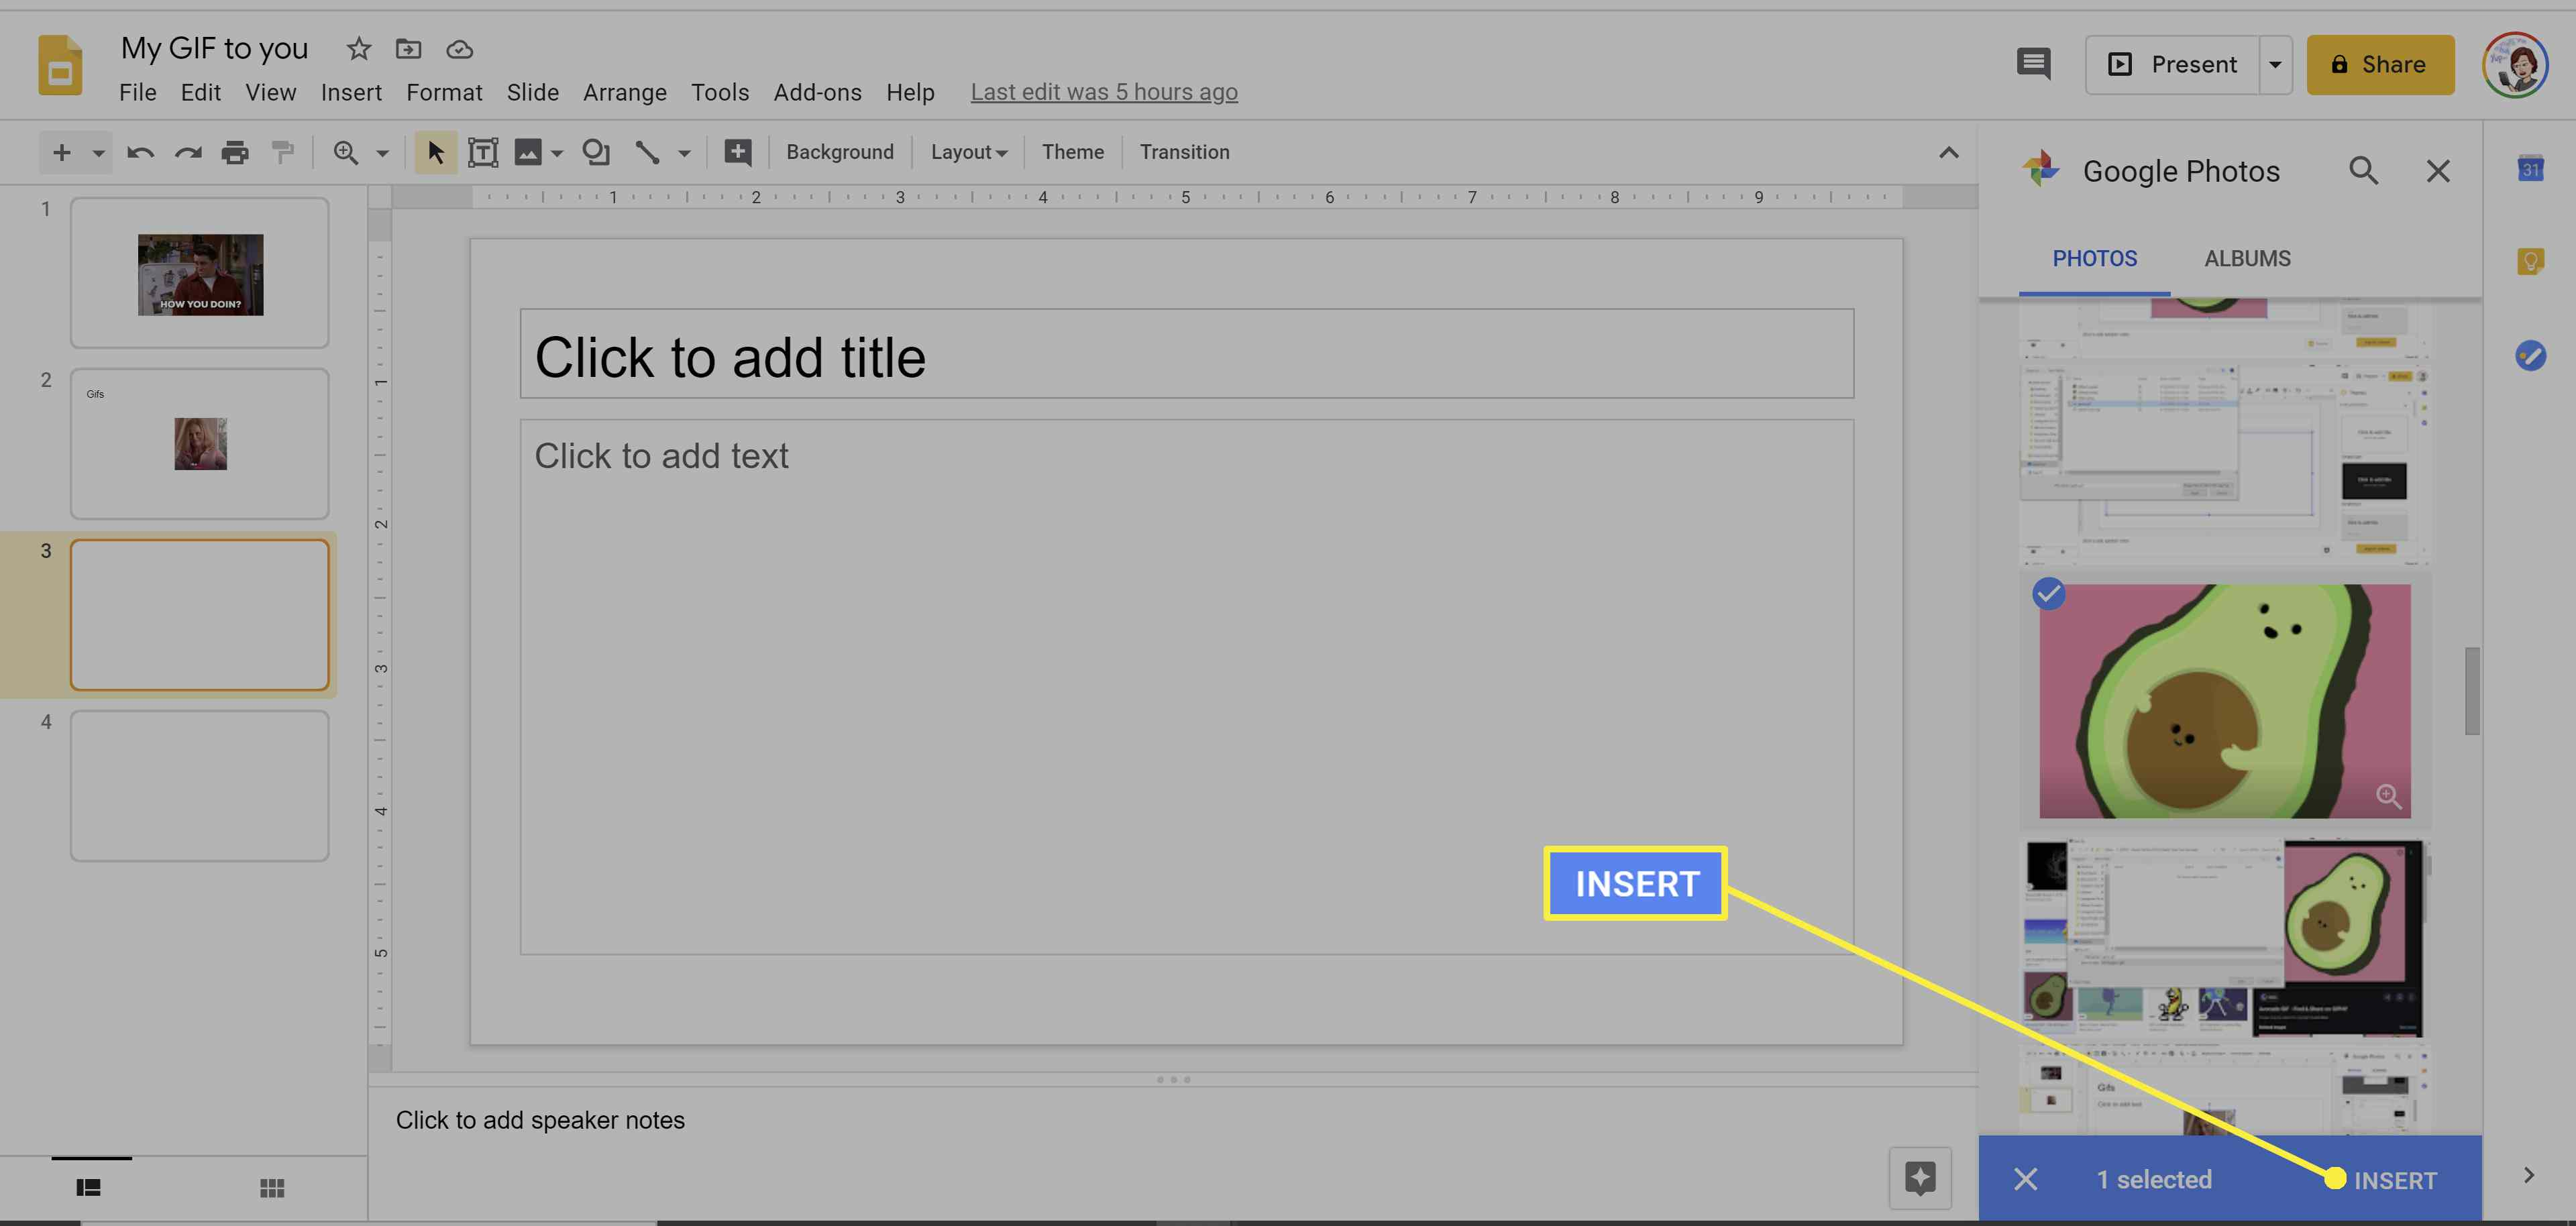 Inserting GIFs into Google Slides.